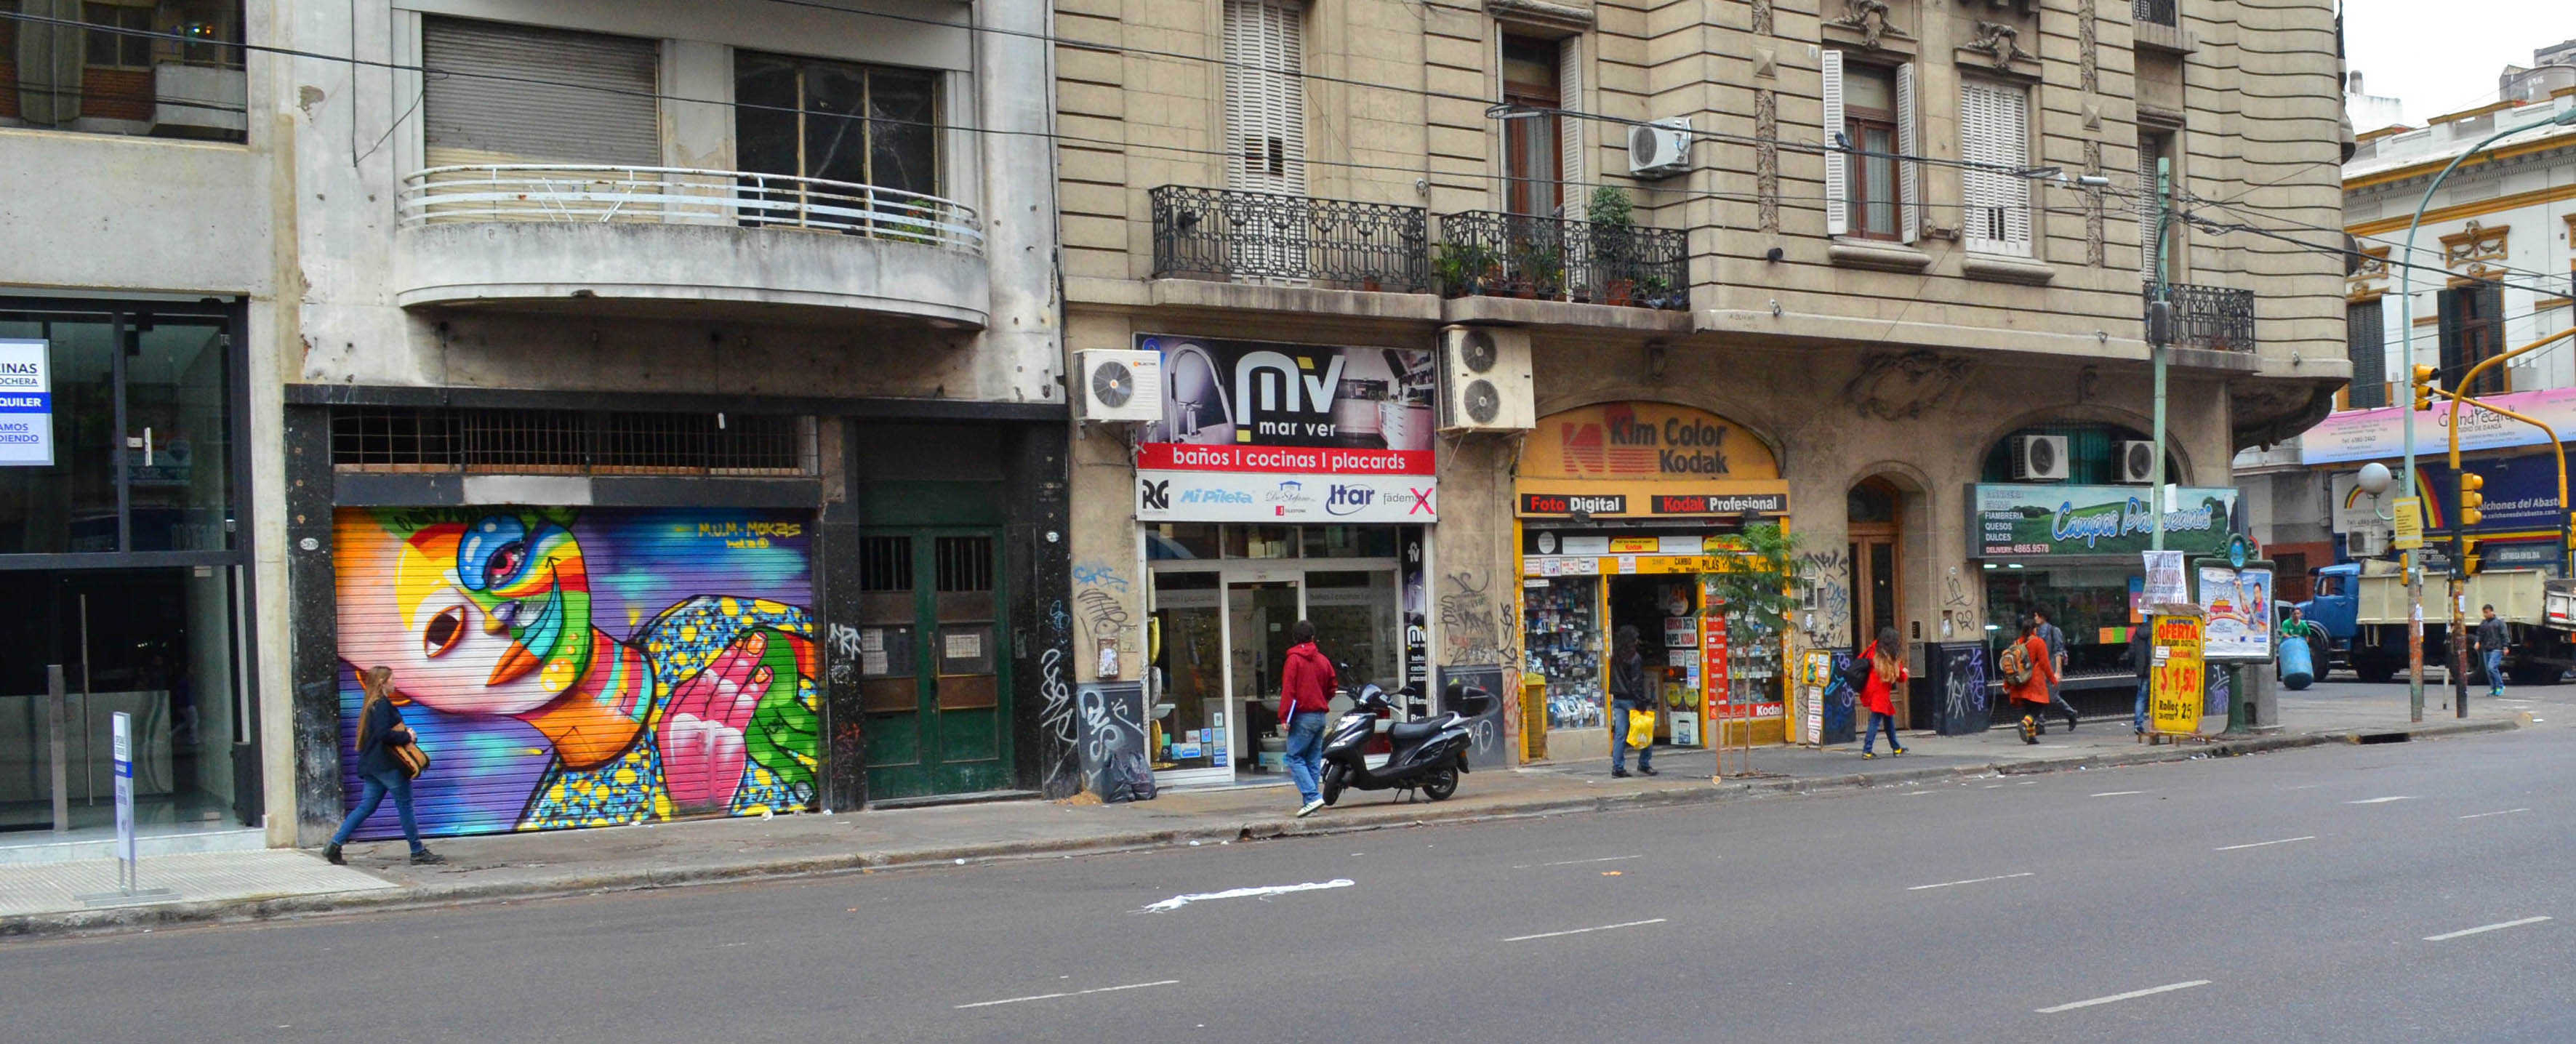 Buenos Aires - Argentina 2013